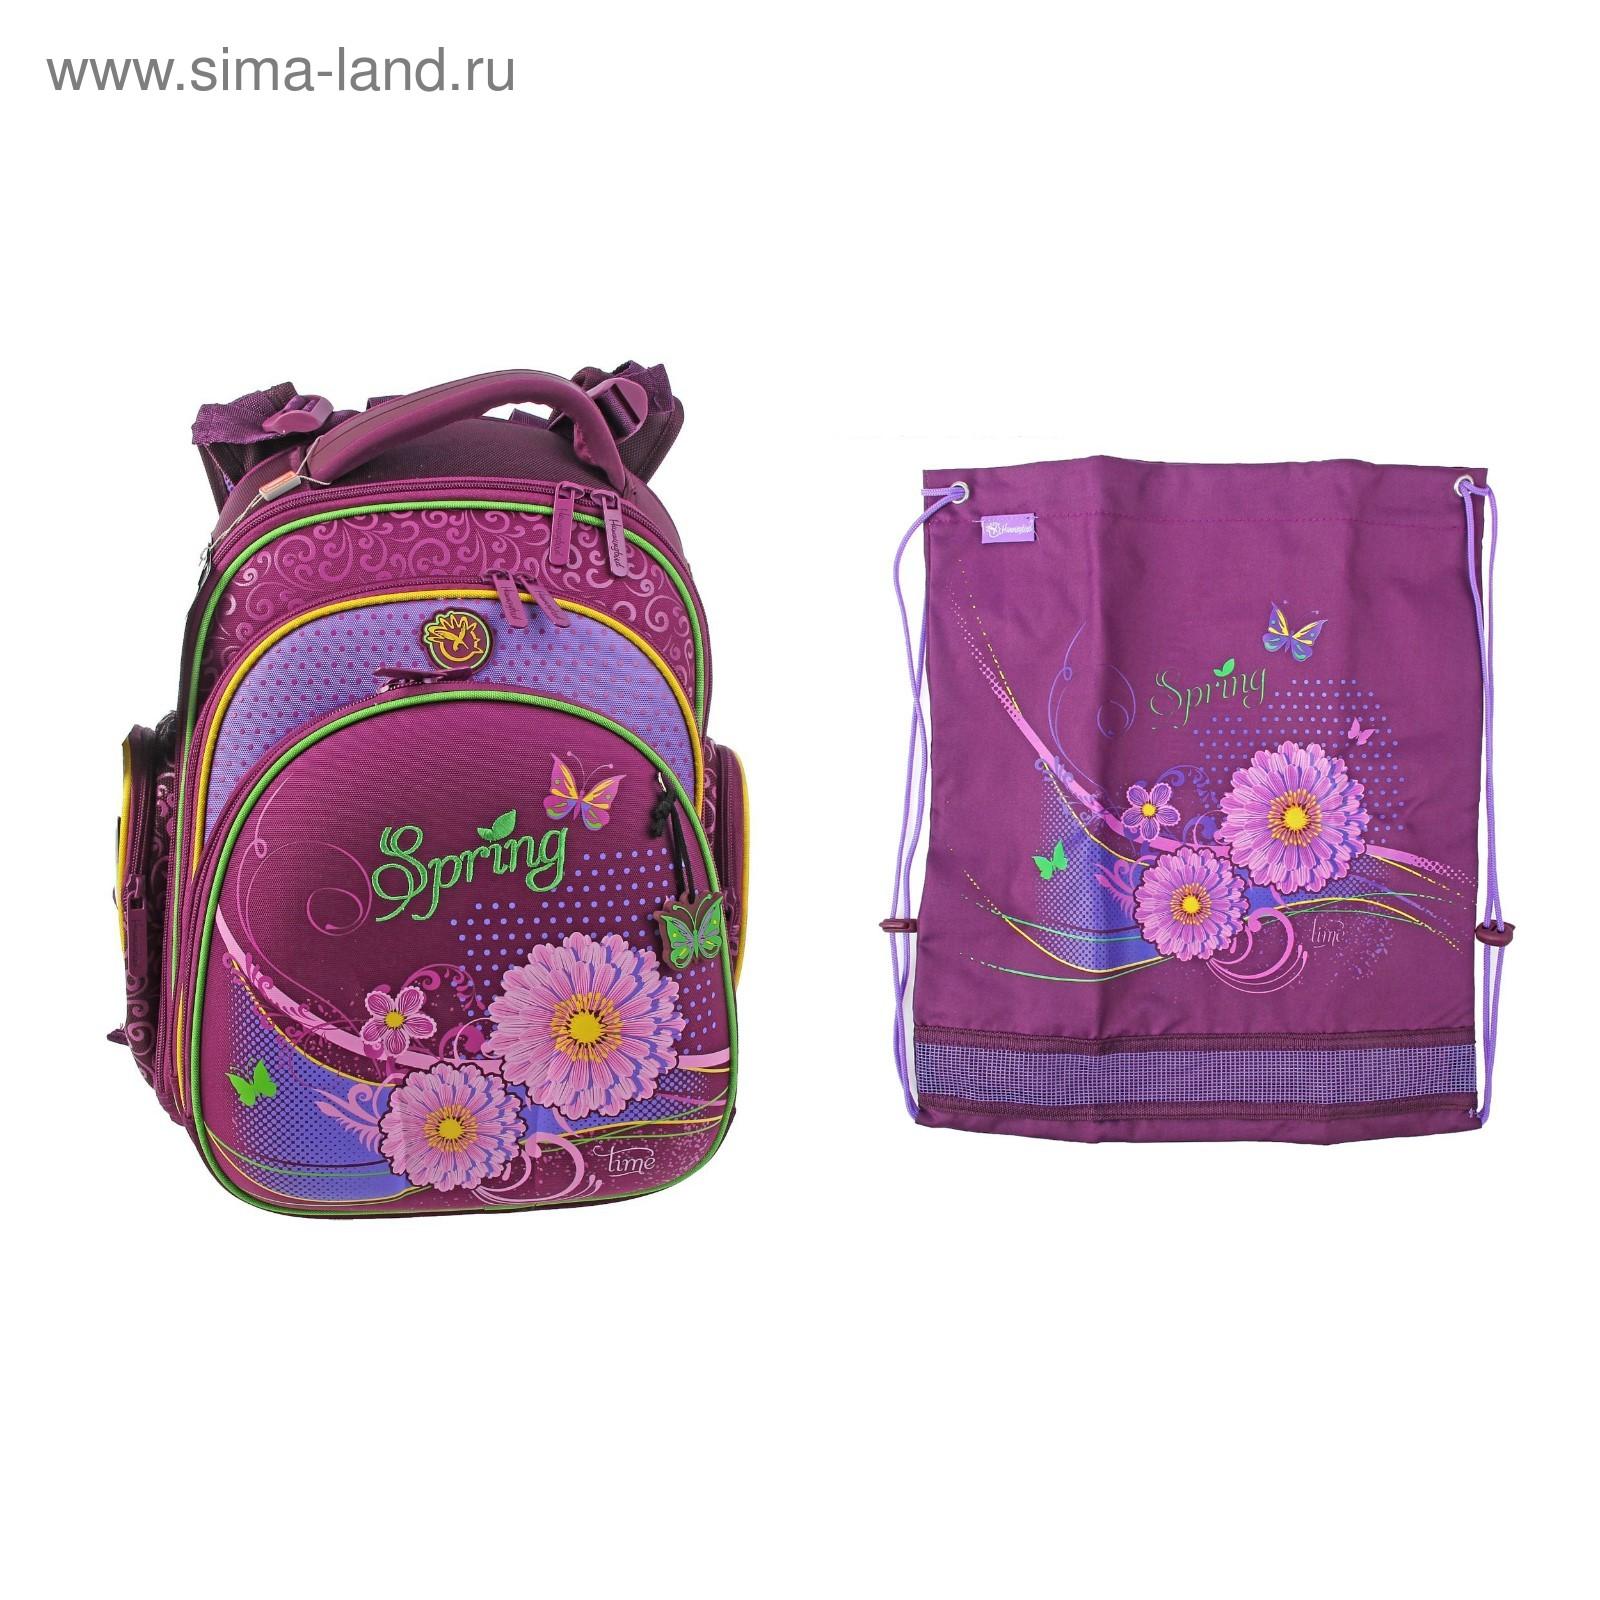 eeadb0e0e552 Рюкзак каркасный Hummingbird 32*27*18 + мешок для обуви, для девочки ...